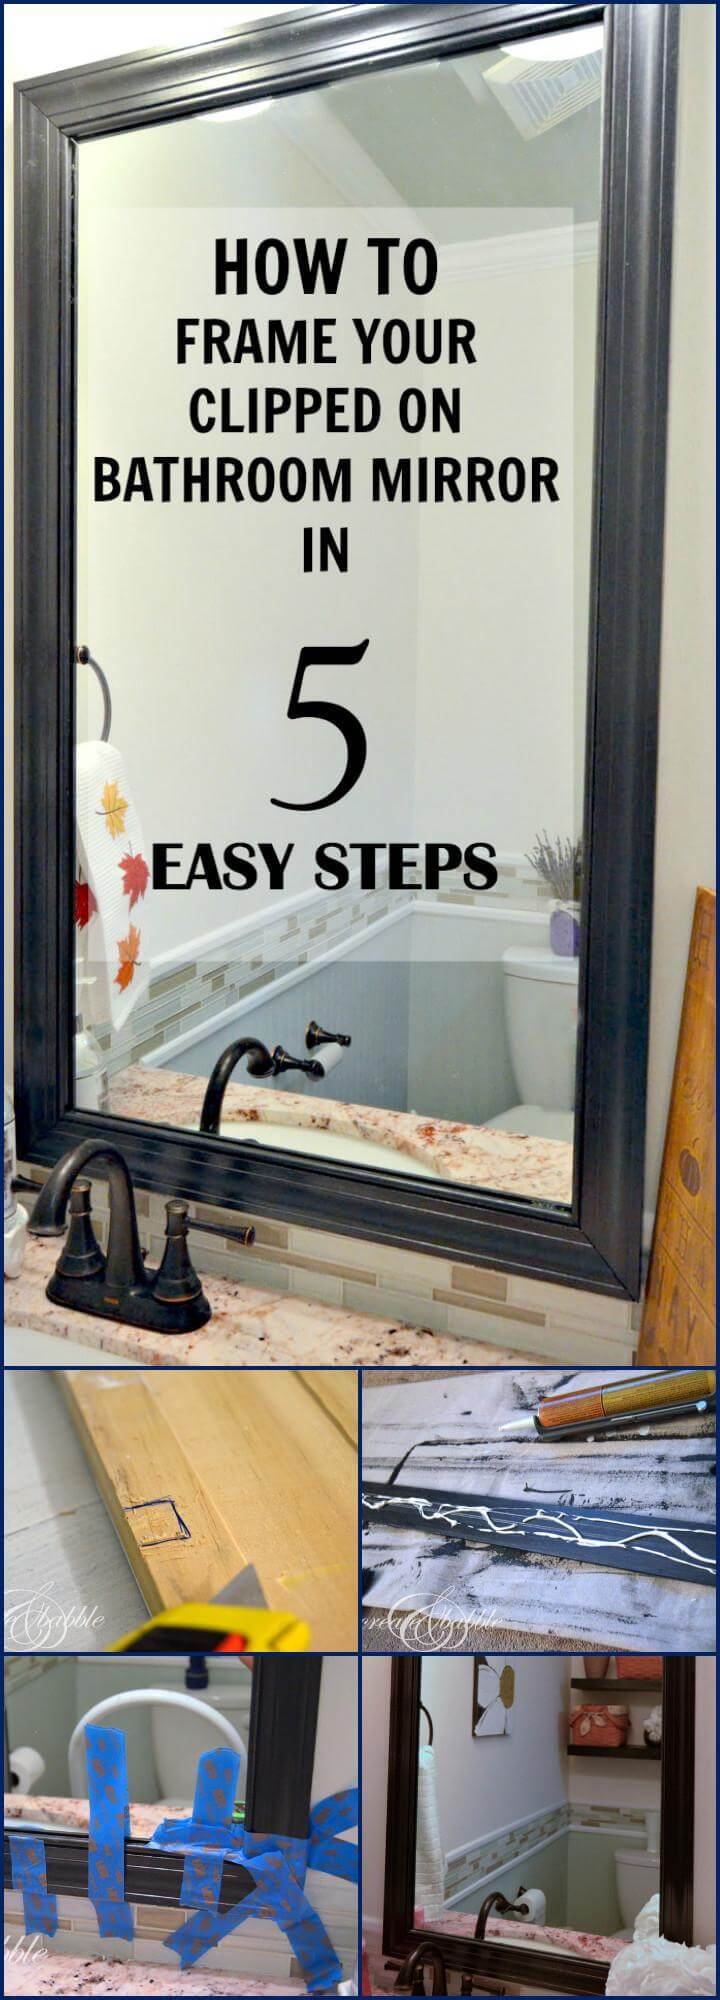 DIY bathroom mirror framing